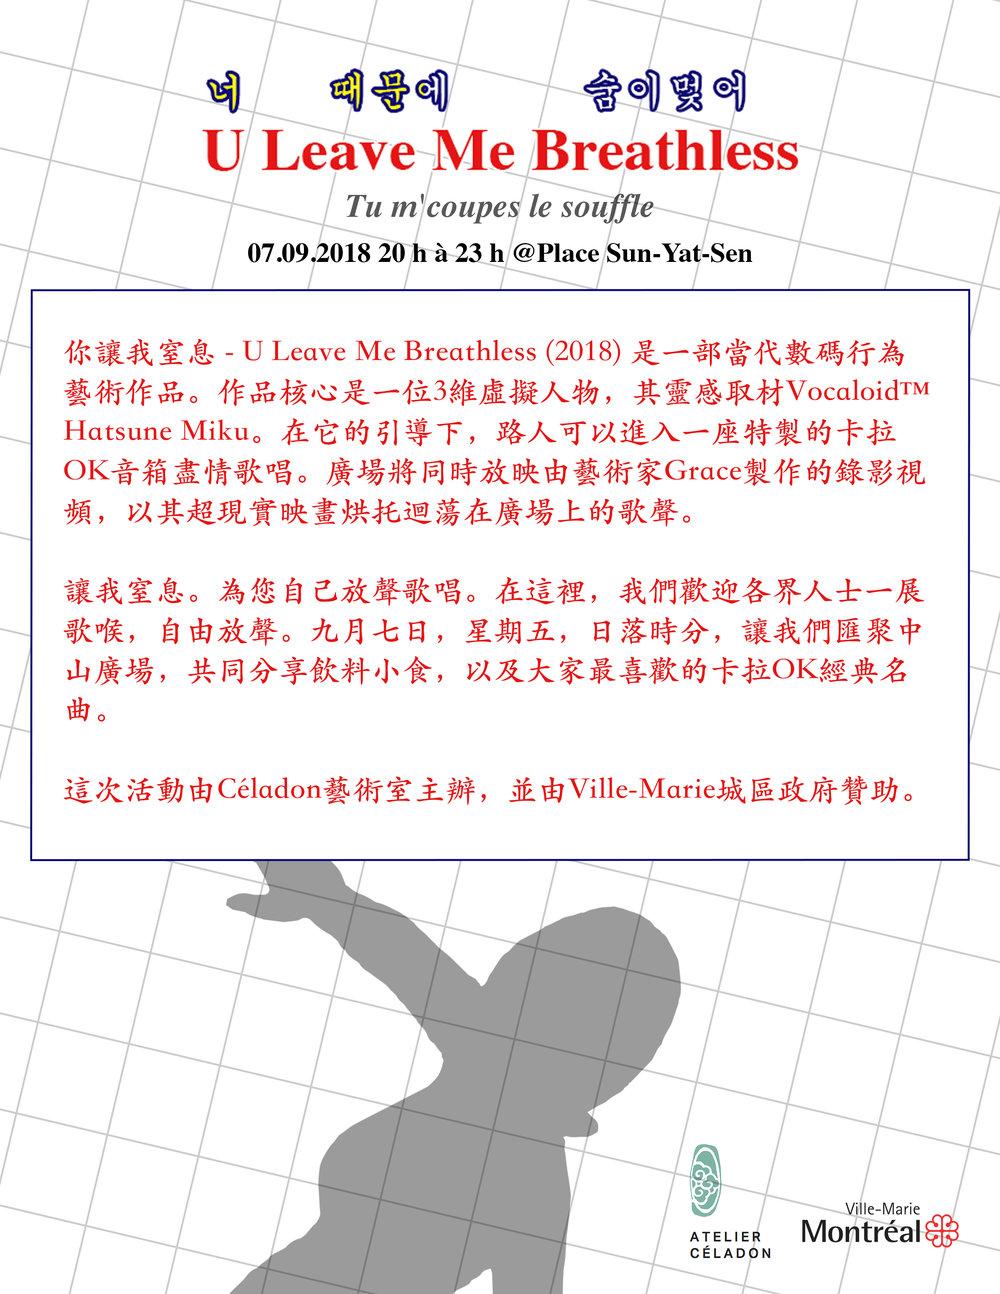 uleavemebreathless-flyer-chinese-02.jpg